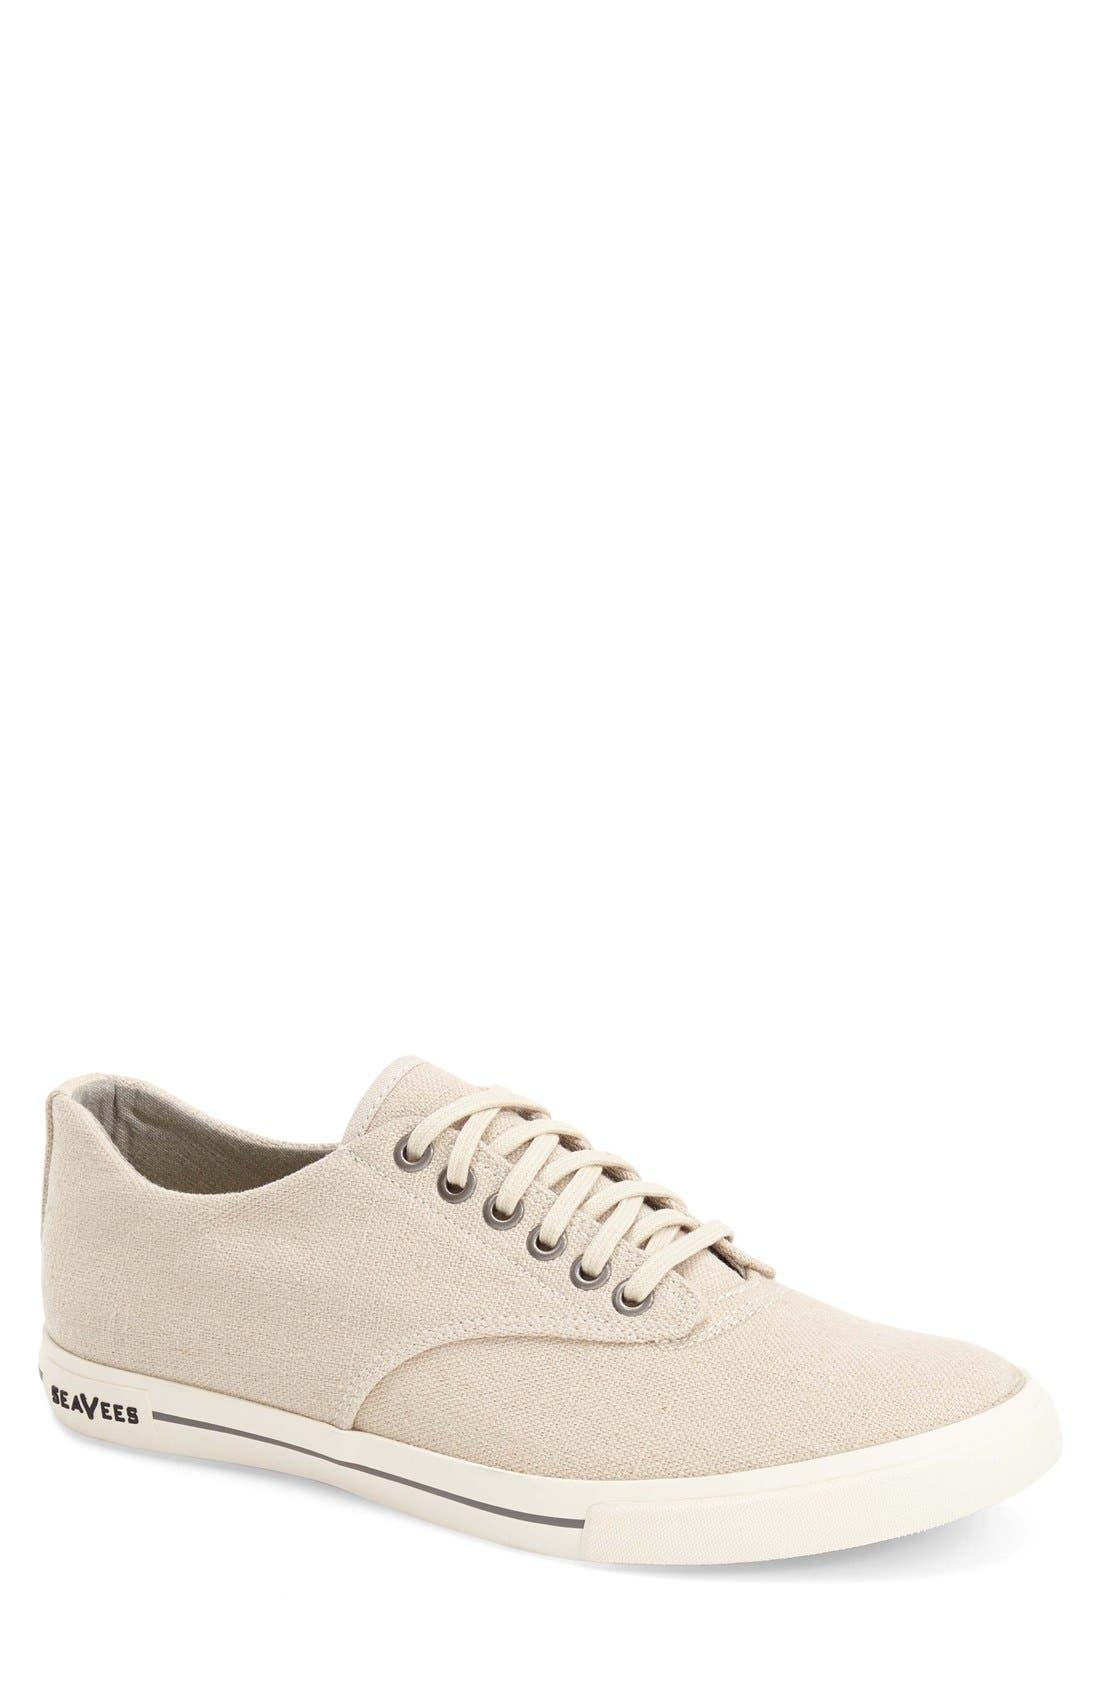 'Hermosa Plimsoll' Sneaker, Main, color, NATURAL